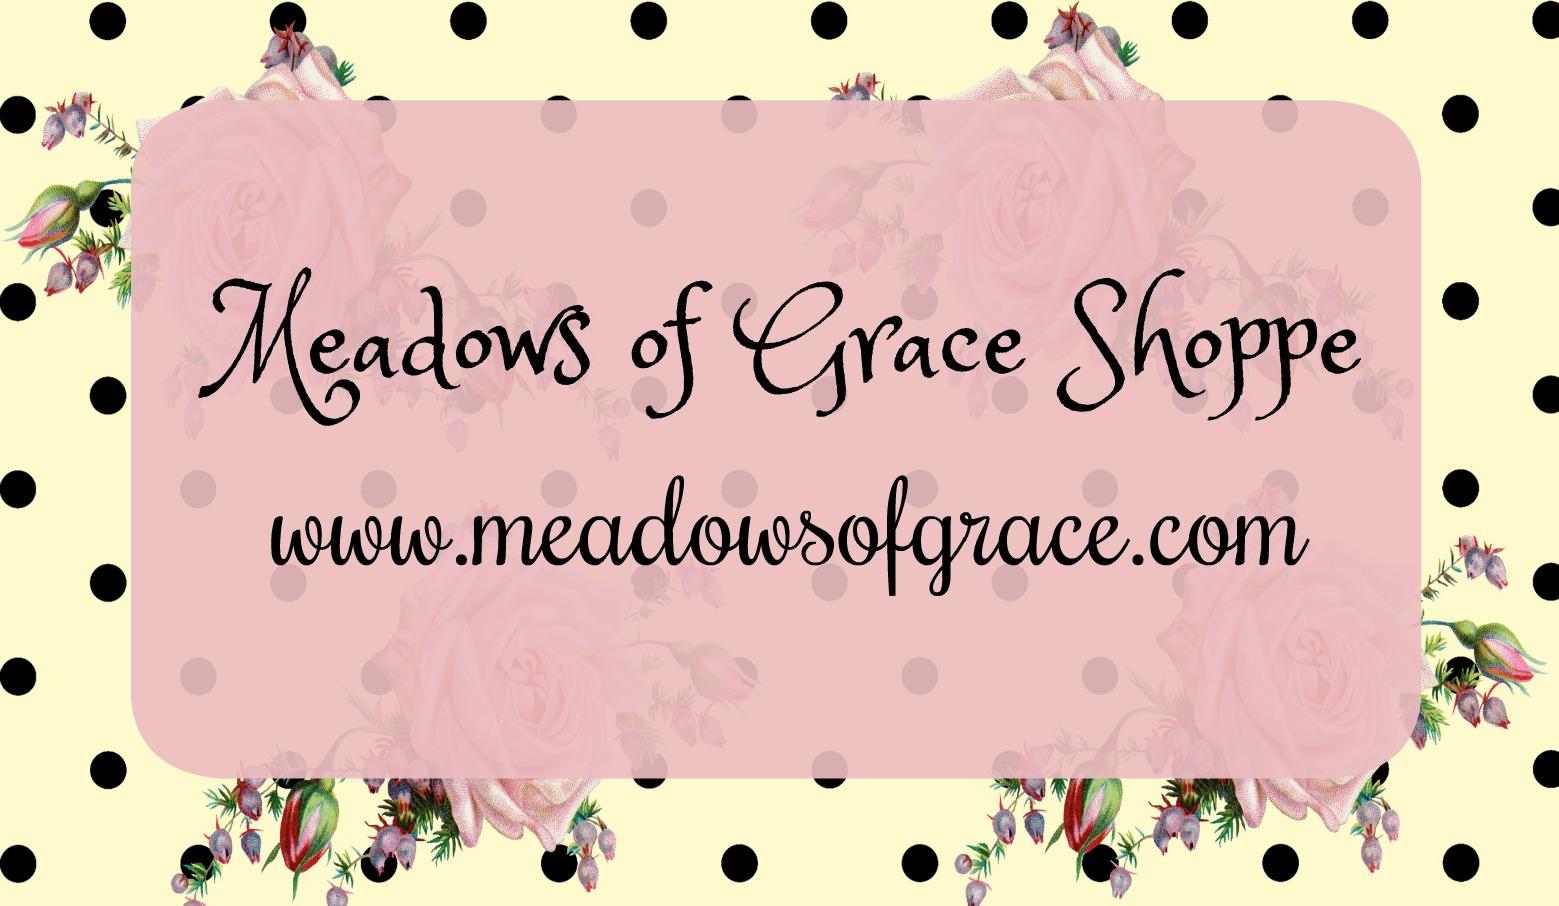 meadows of grace (1)